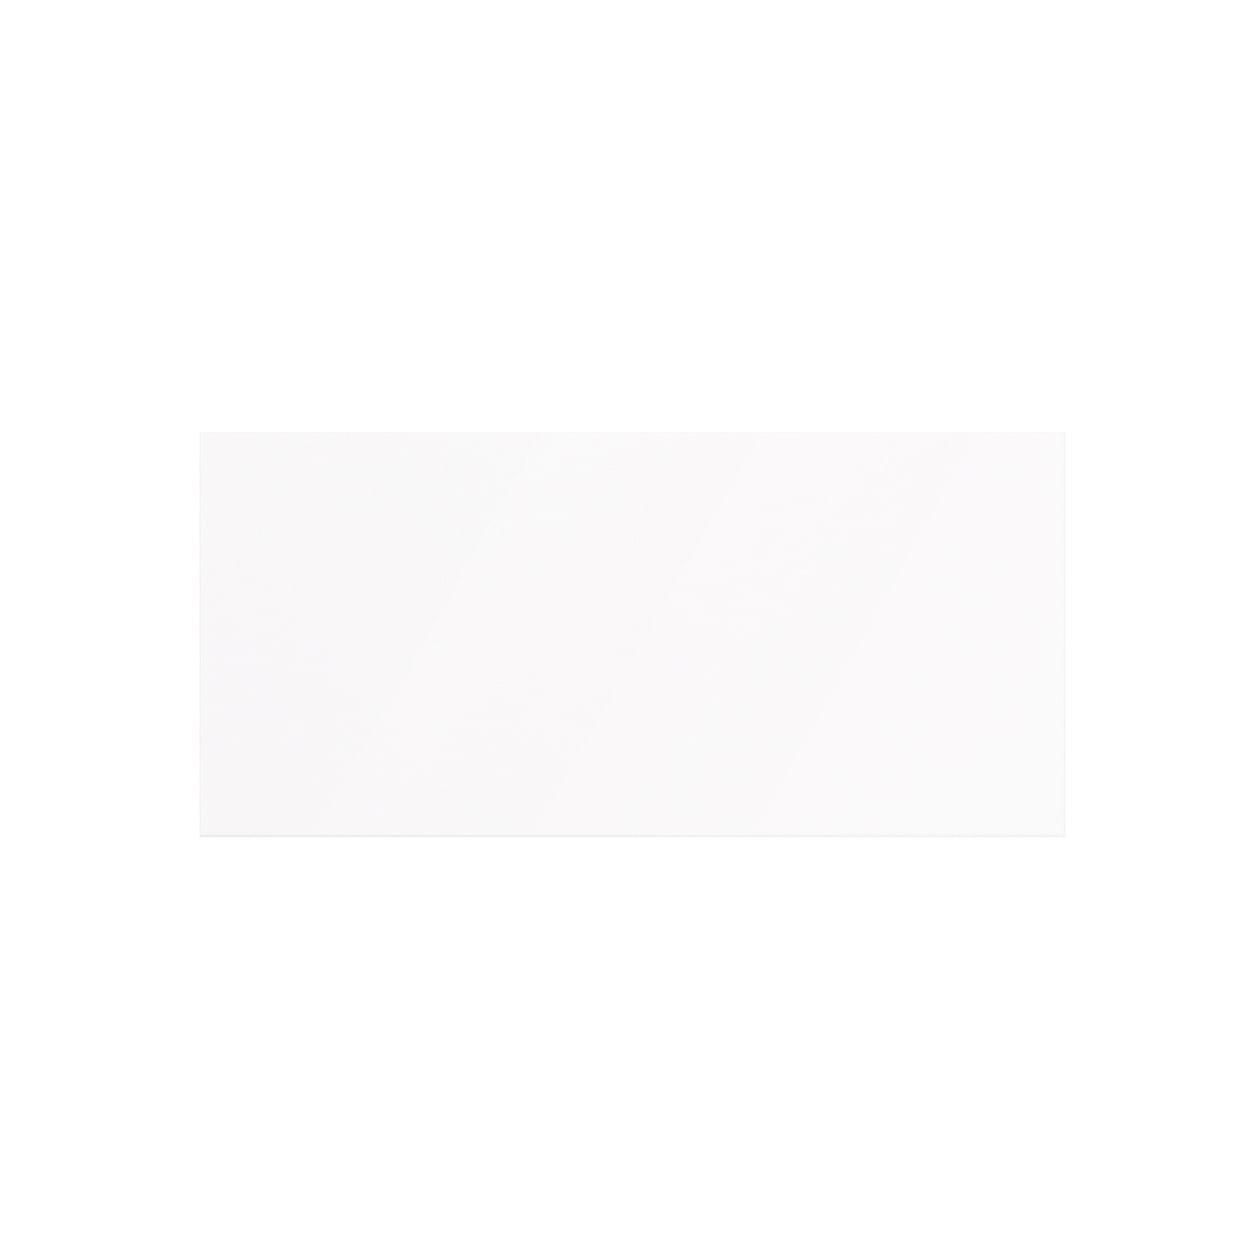 A31シート コットン スノーホワイト 116.3g